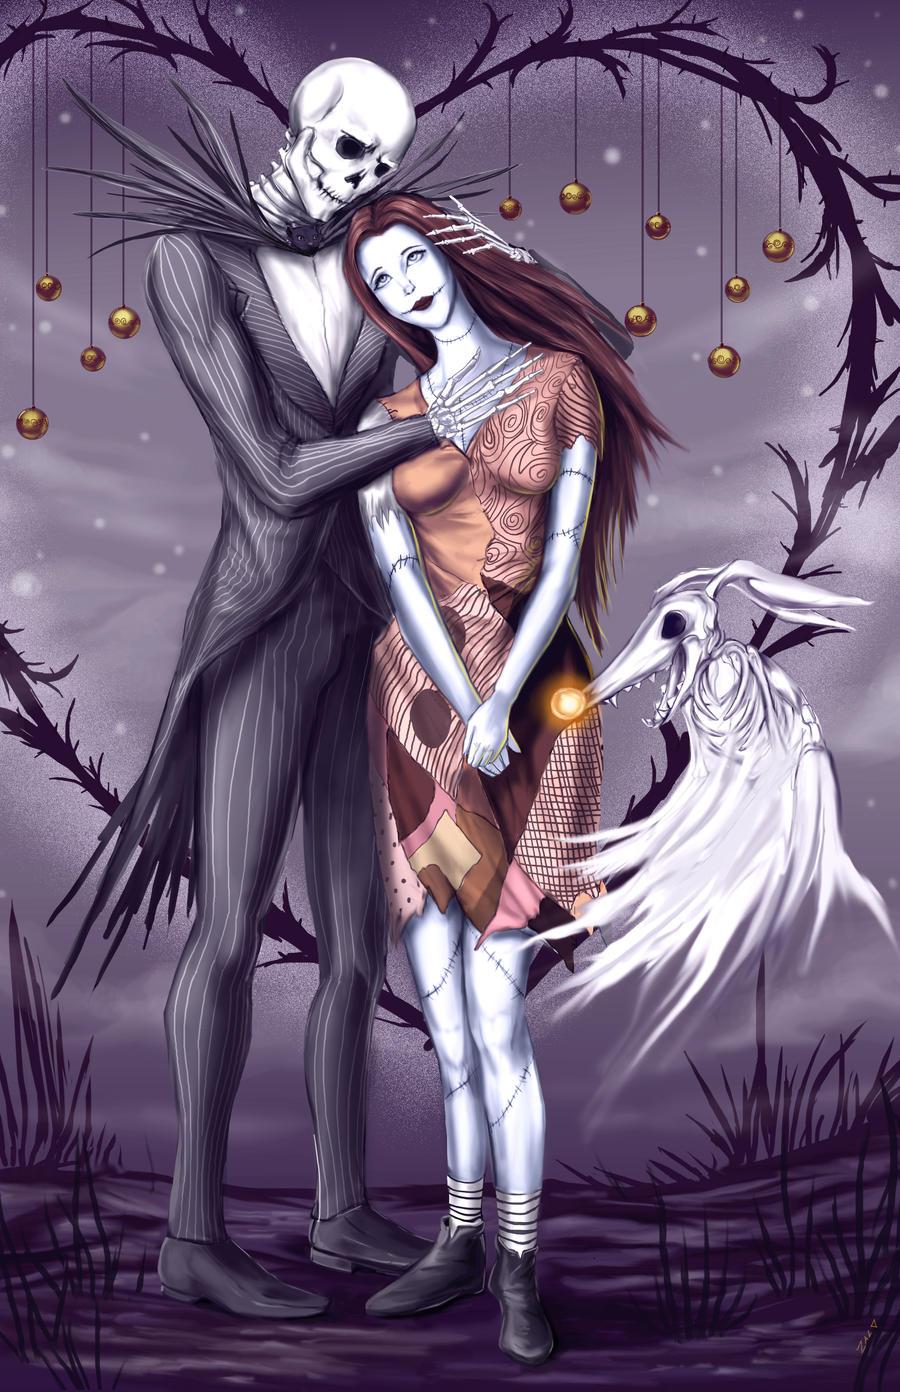 Jack and Sally by ZaloHero on DeviantArt